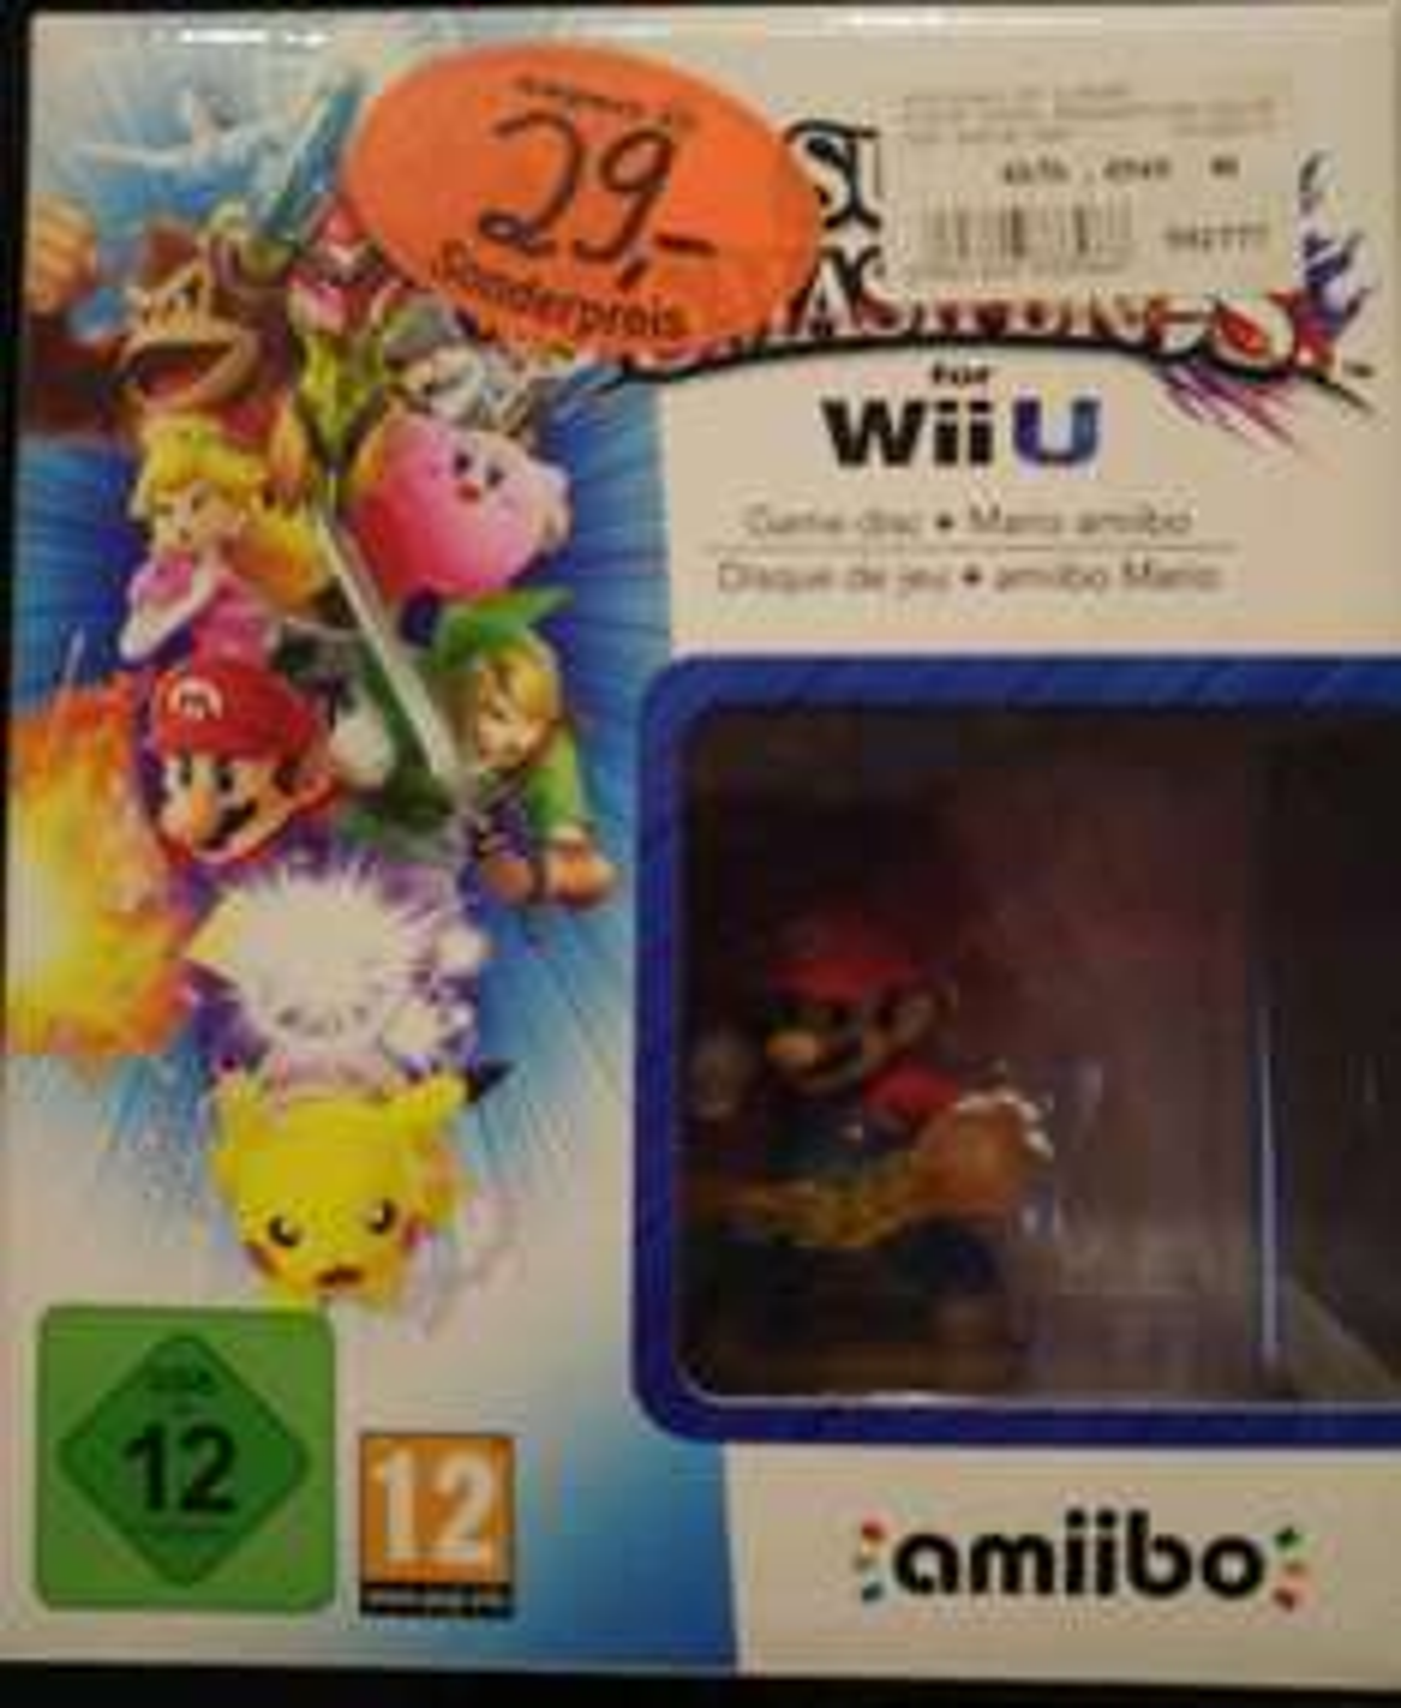 [Immernoch aktuell (12.11.)] [Lokal Bayreuth] Super Smash Bros inkl. Amiibo (Wii U) für 29€ bei Expert Jakob